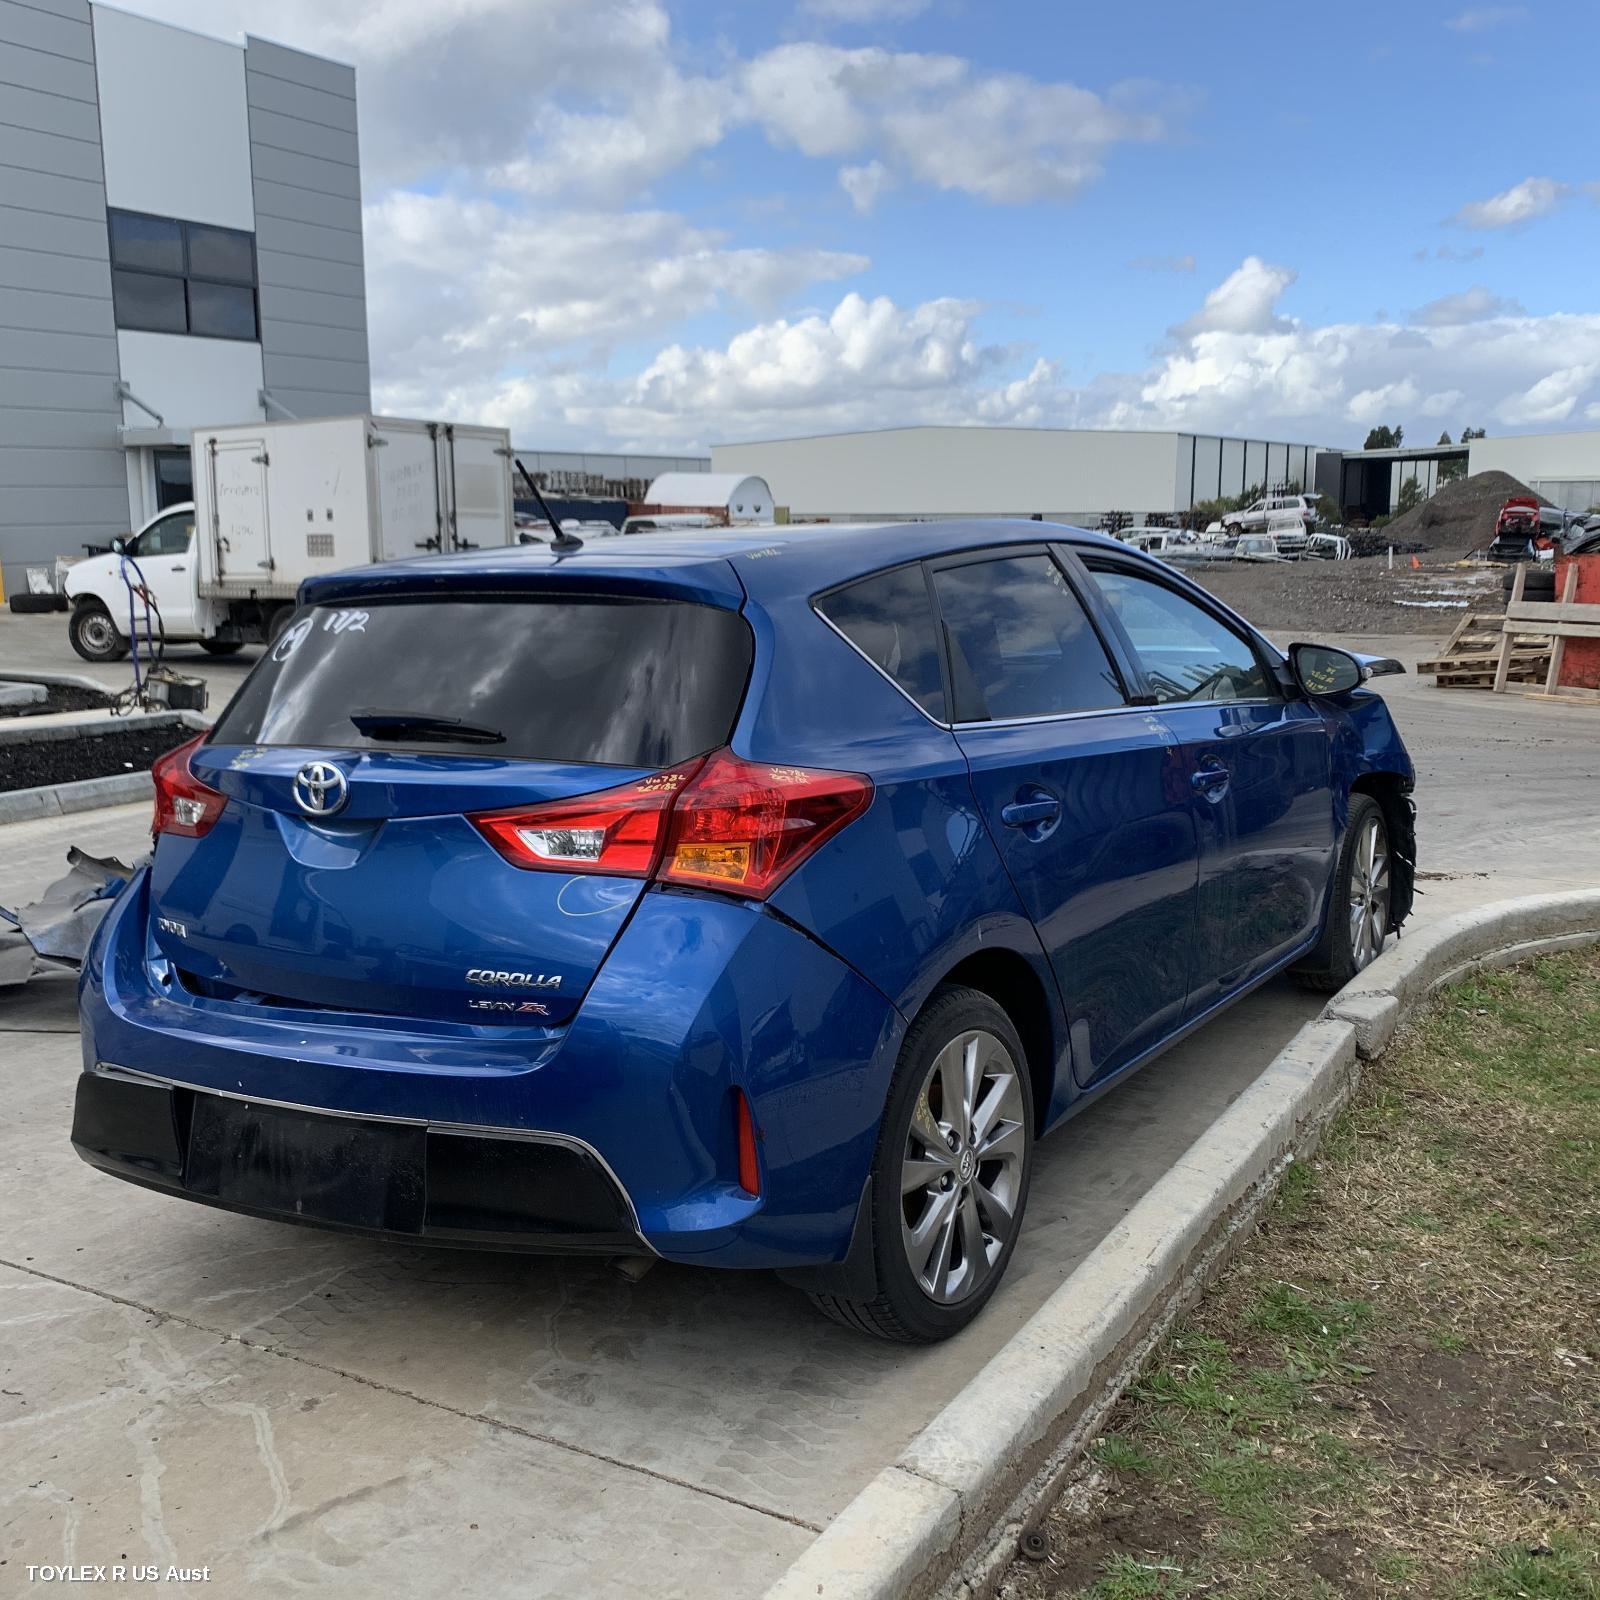 Toyota COROLLA LEVIN ZR ZRE182R 2ZR-FE 1.8L Engine Automatic FWD Transmission 10/12 - 06/18